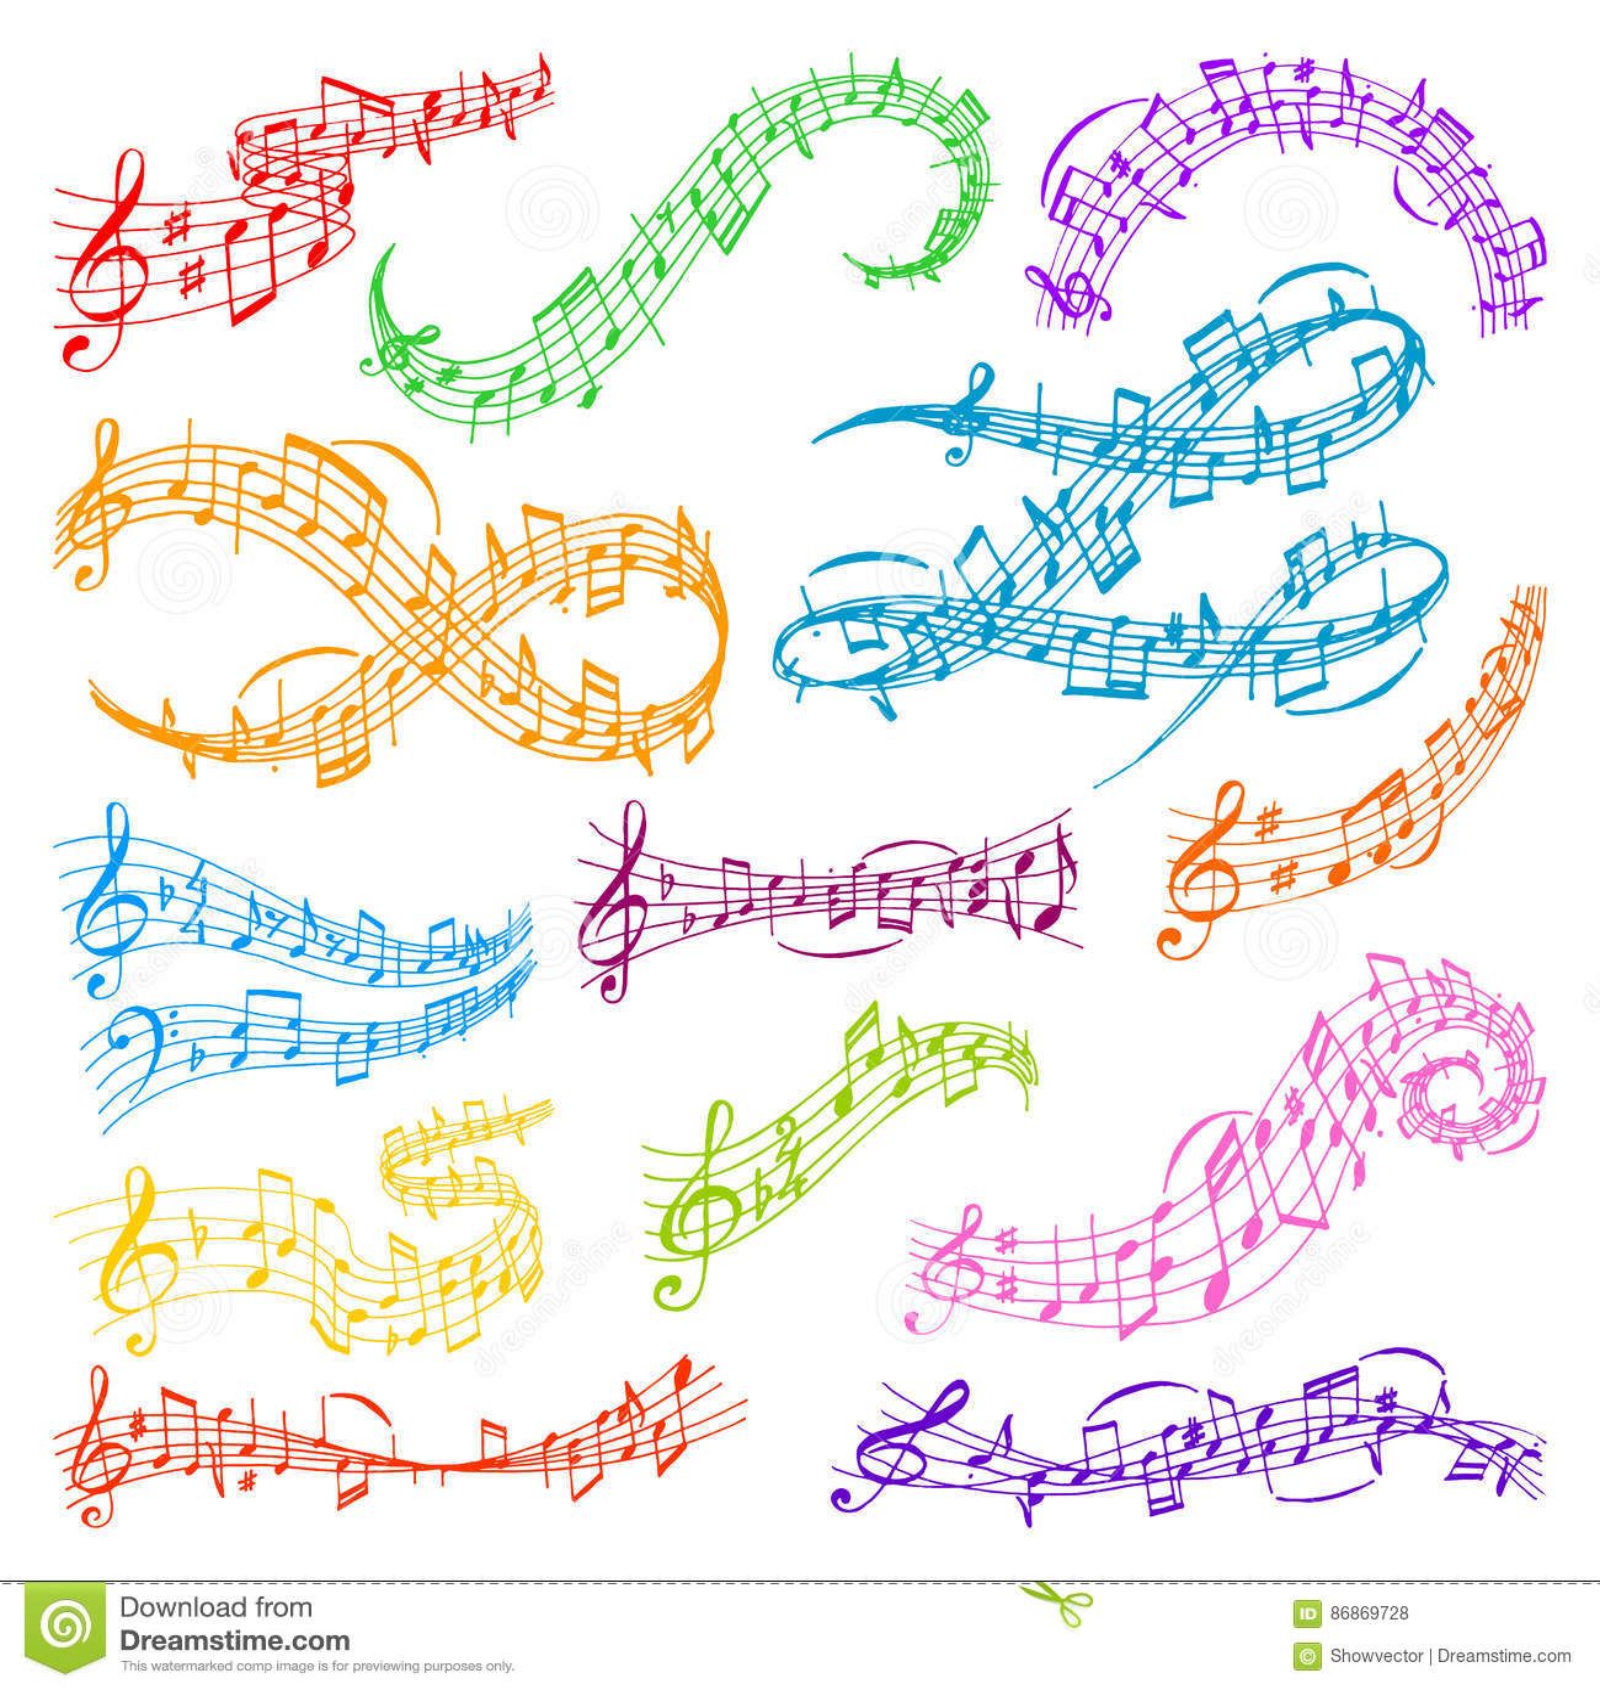 Vector music note melody symbols vector illustration